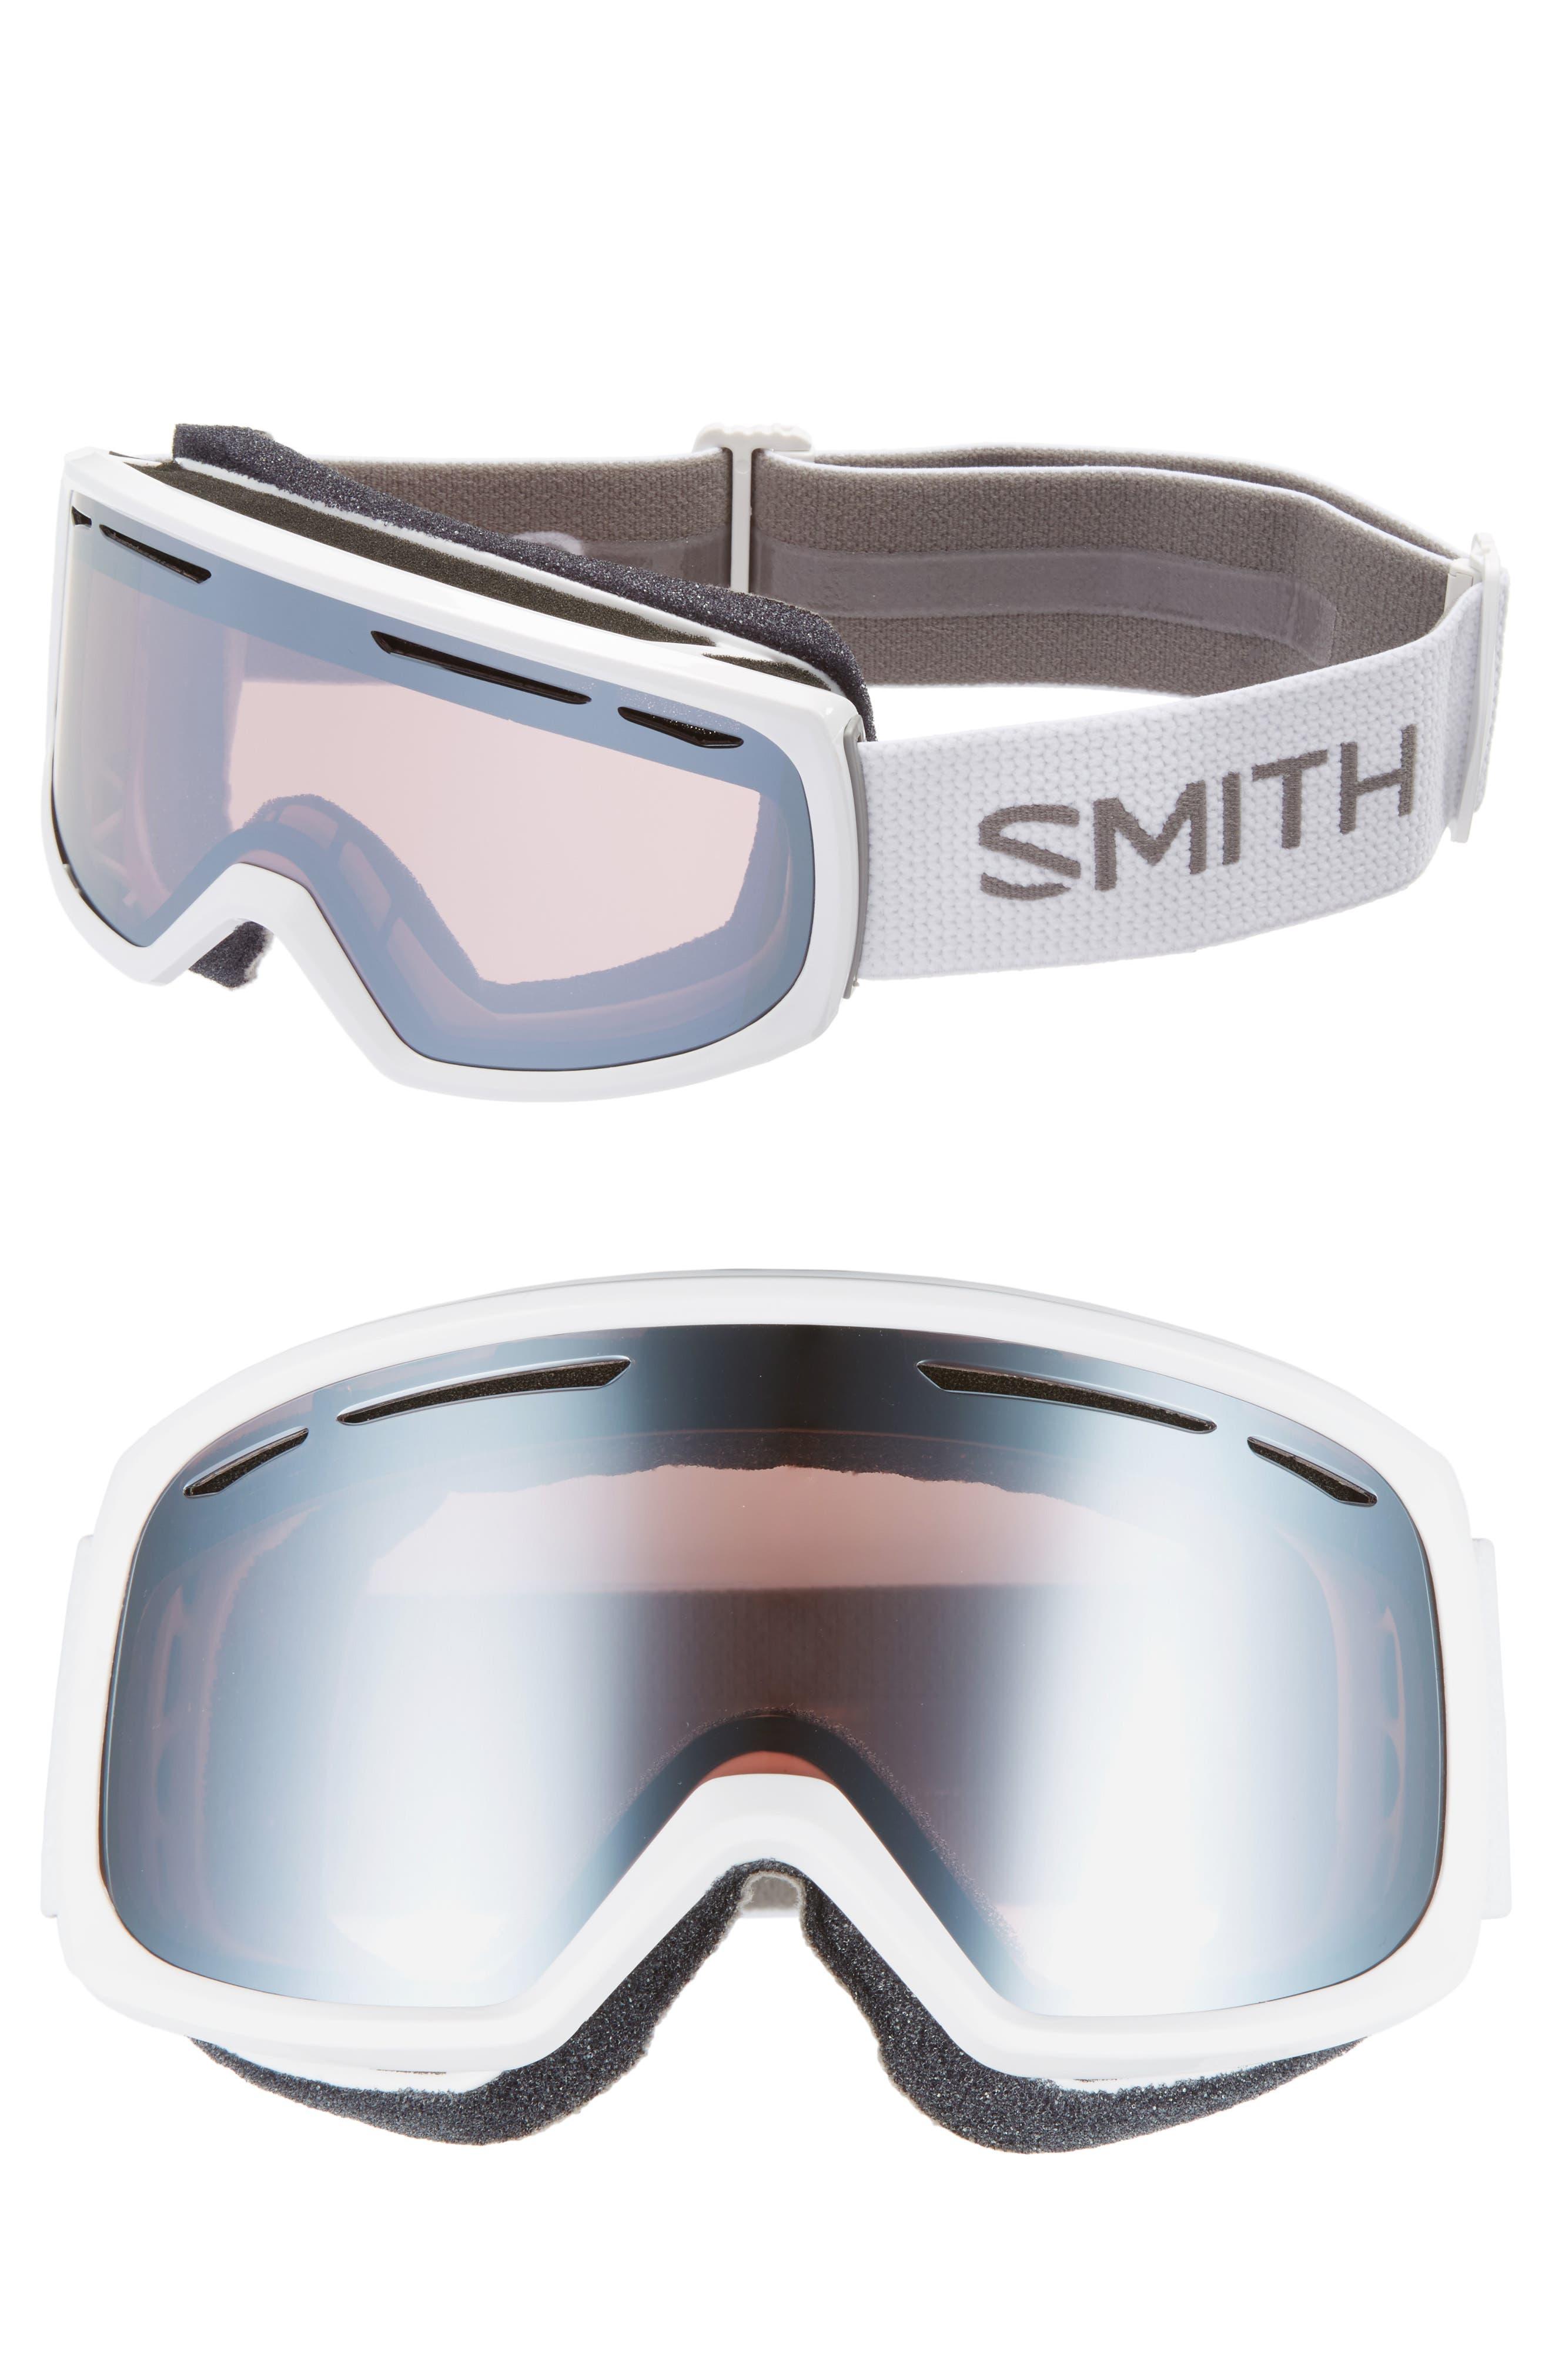 Drift Snow Goggles,                             Main thumbnail 1, color,                             White/ Mirror